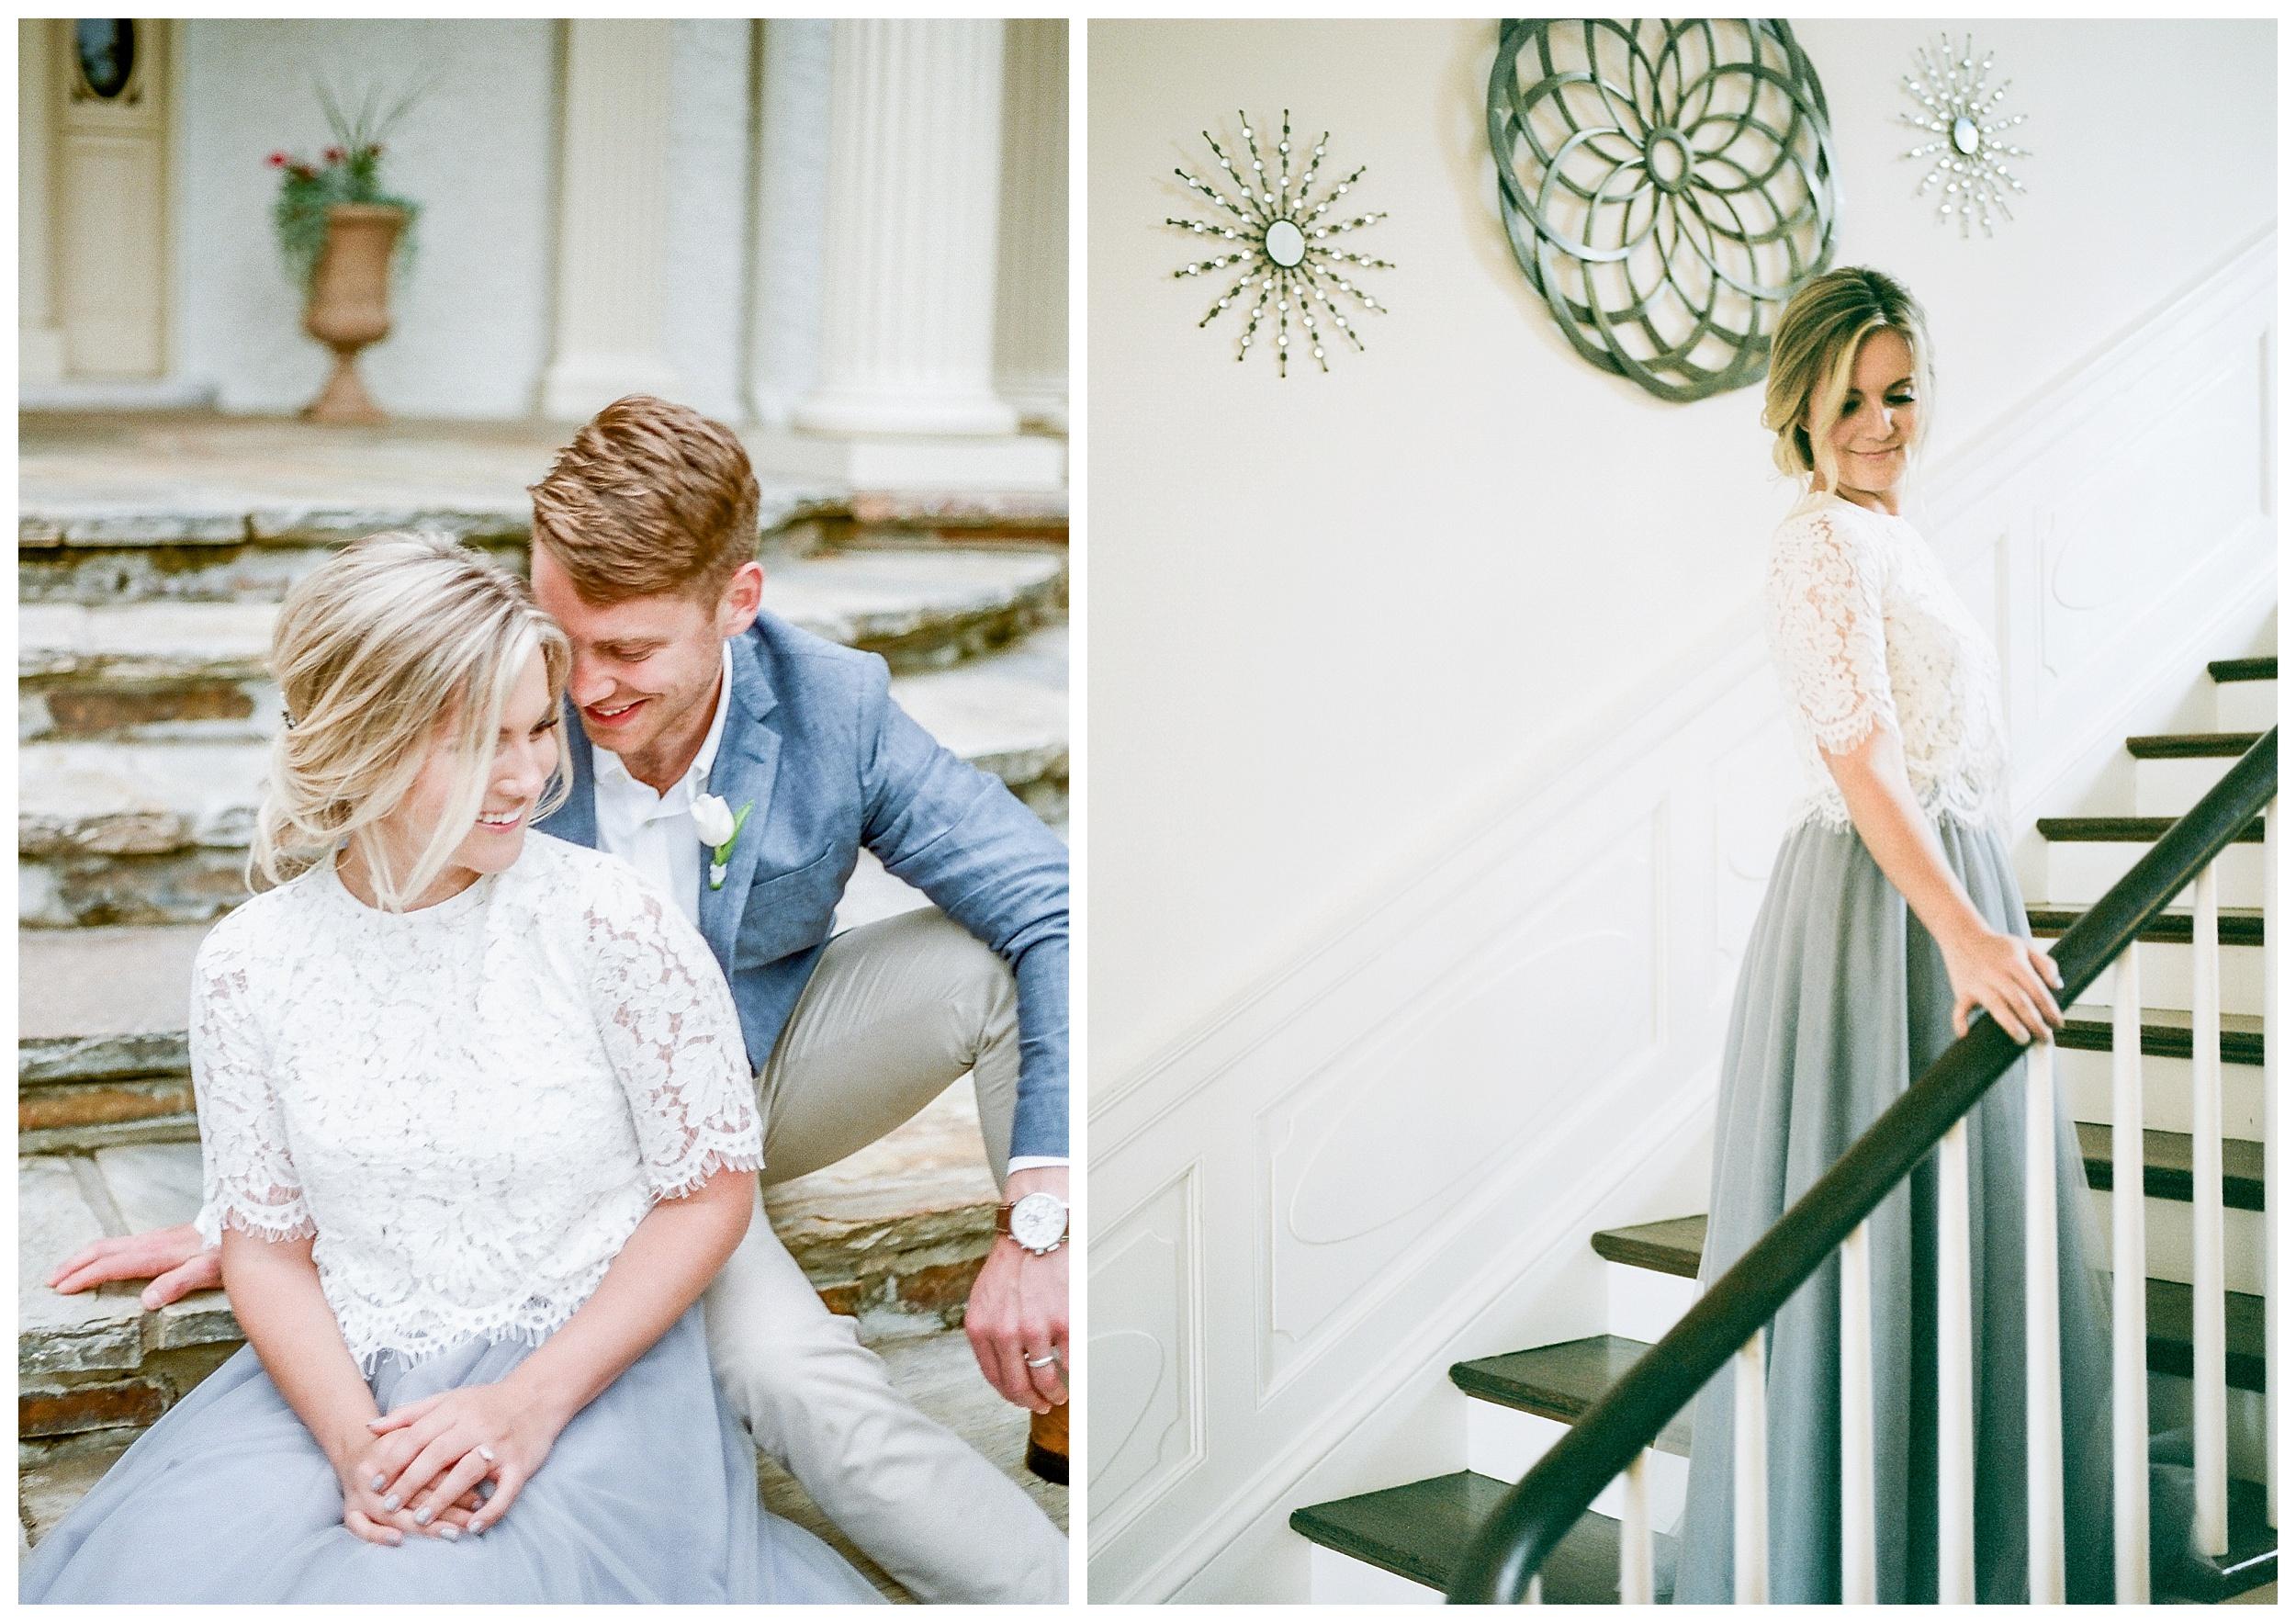 Rust Manor Wedding   Virginia Wedding Photographer Kir Tuben_0043.jpg